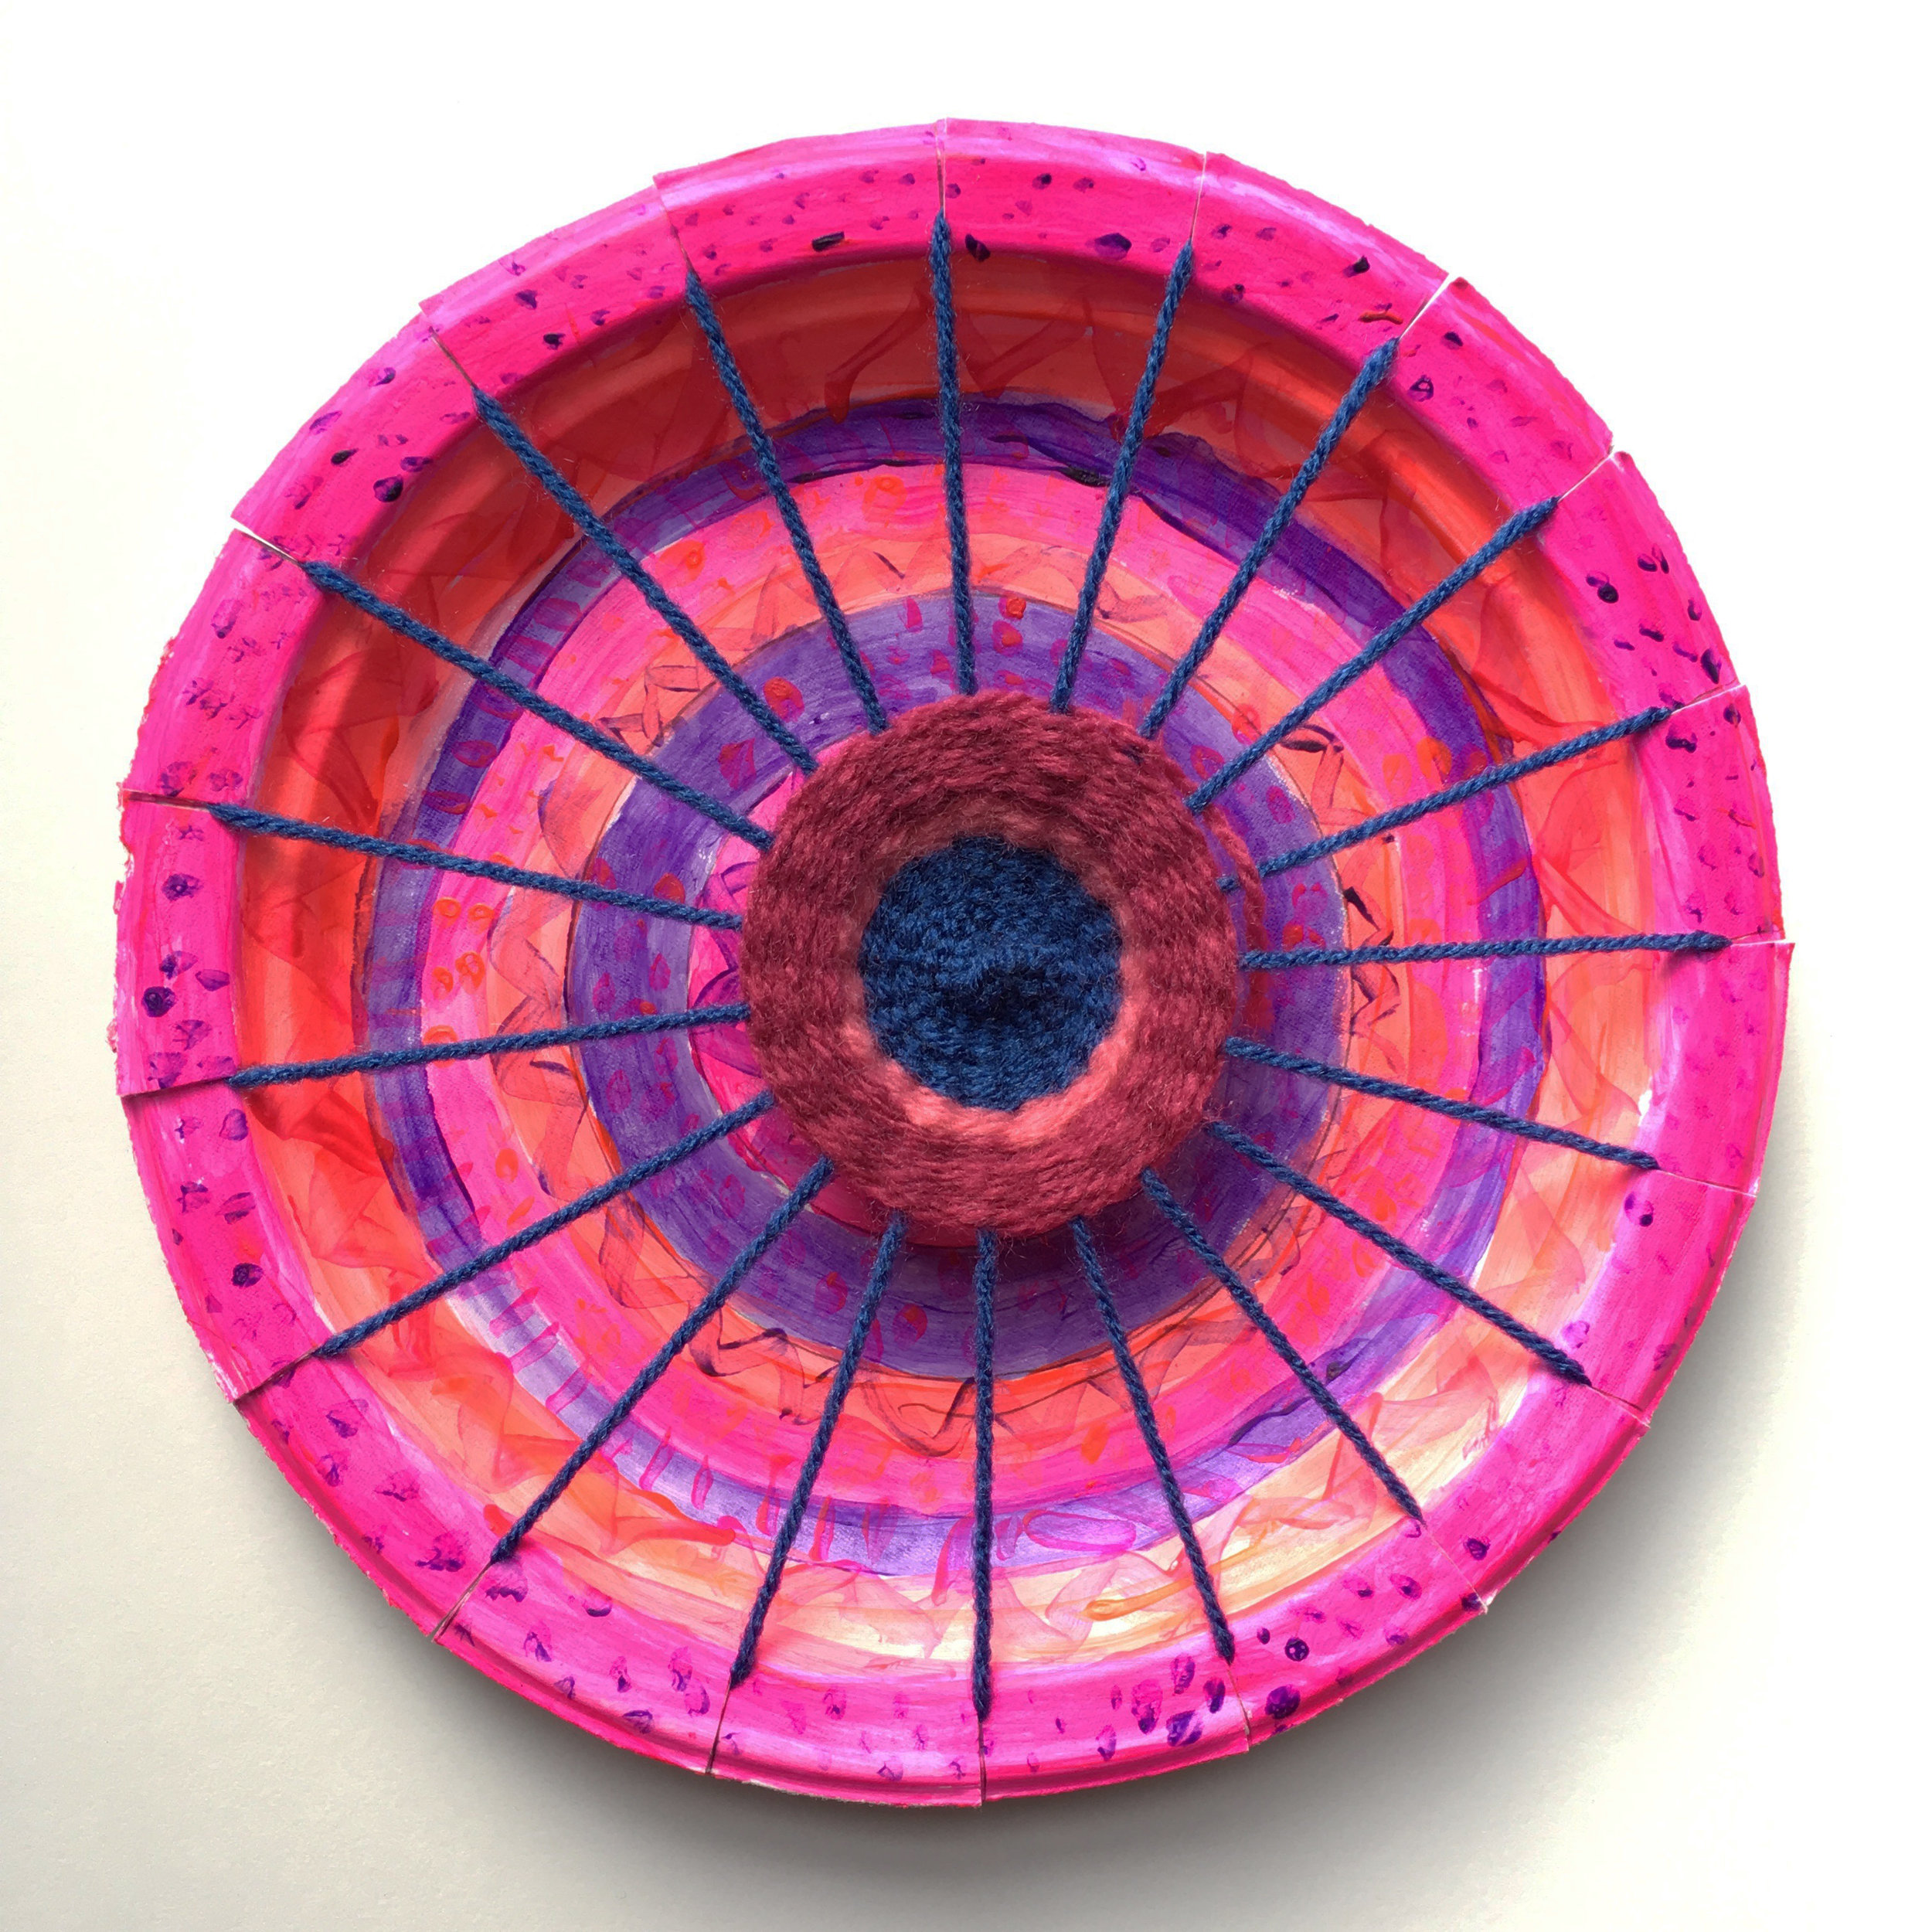 Jaelani_circular weaving_01.jpg